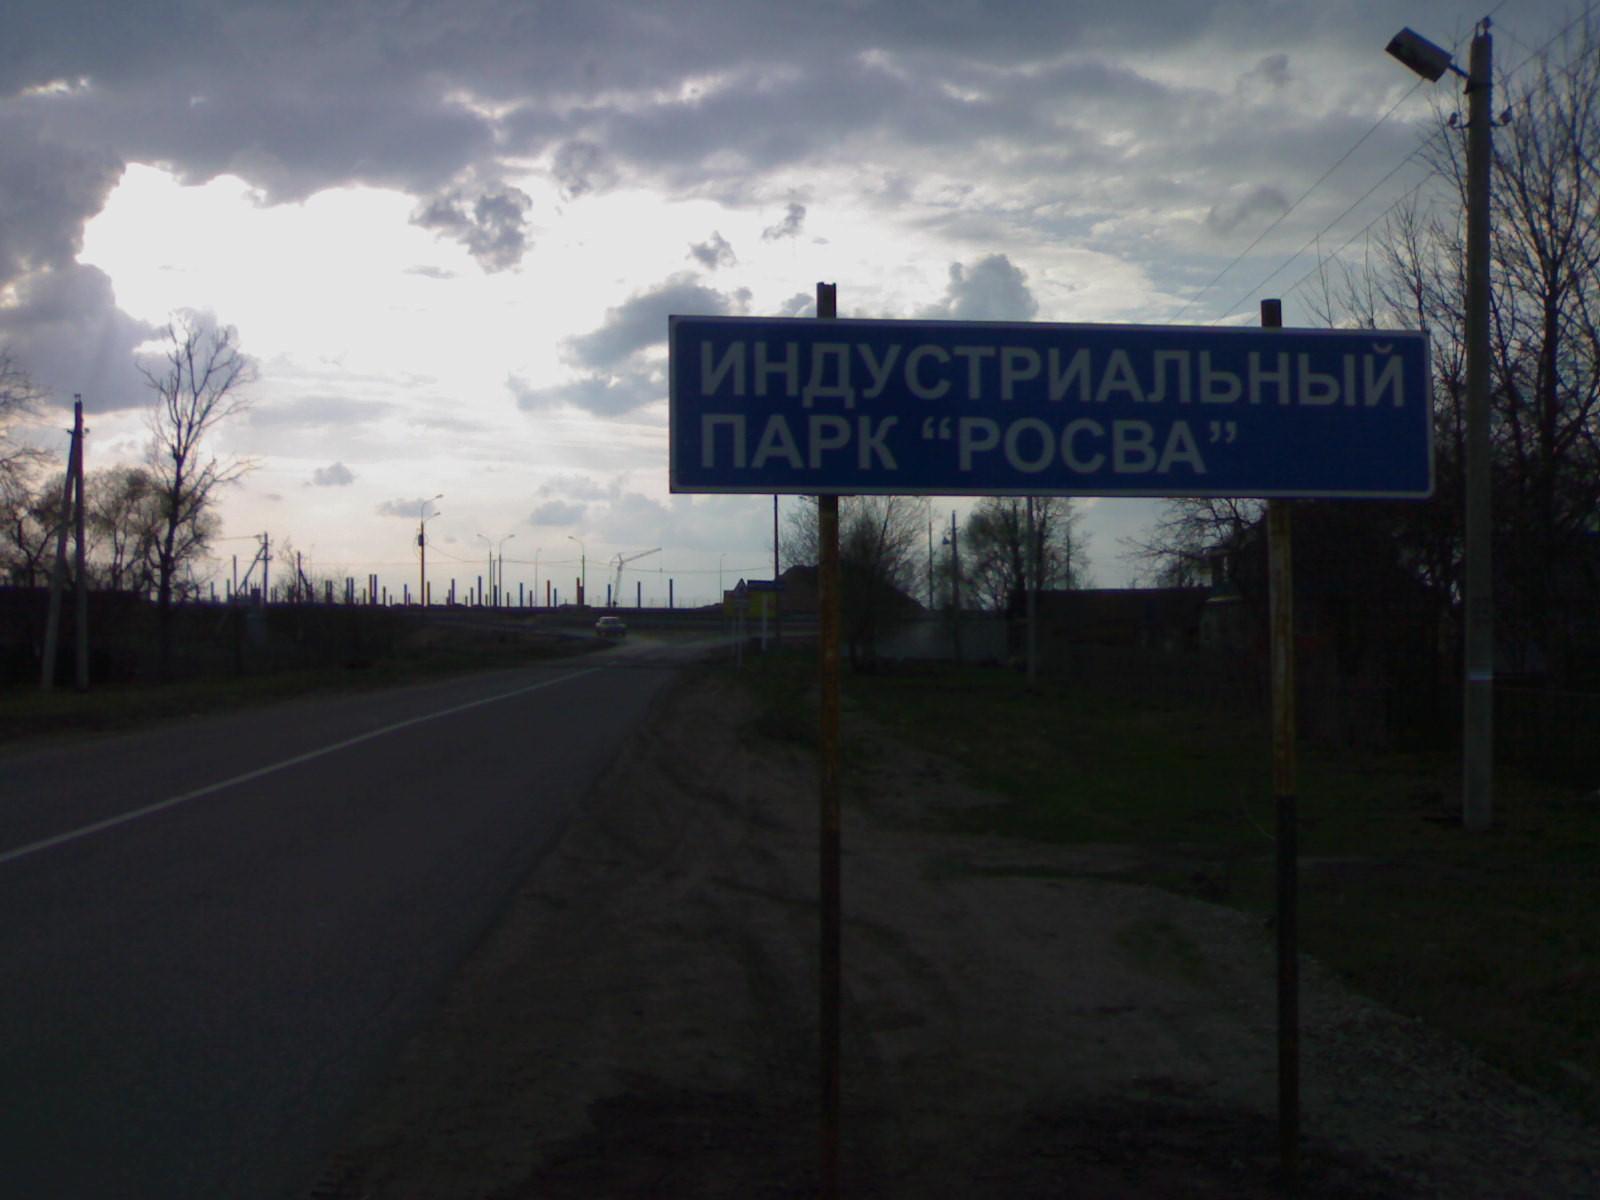 http://turist40.ru/images/mmsblog/00028_00030.jpg